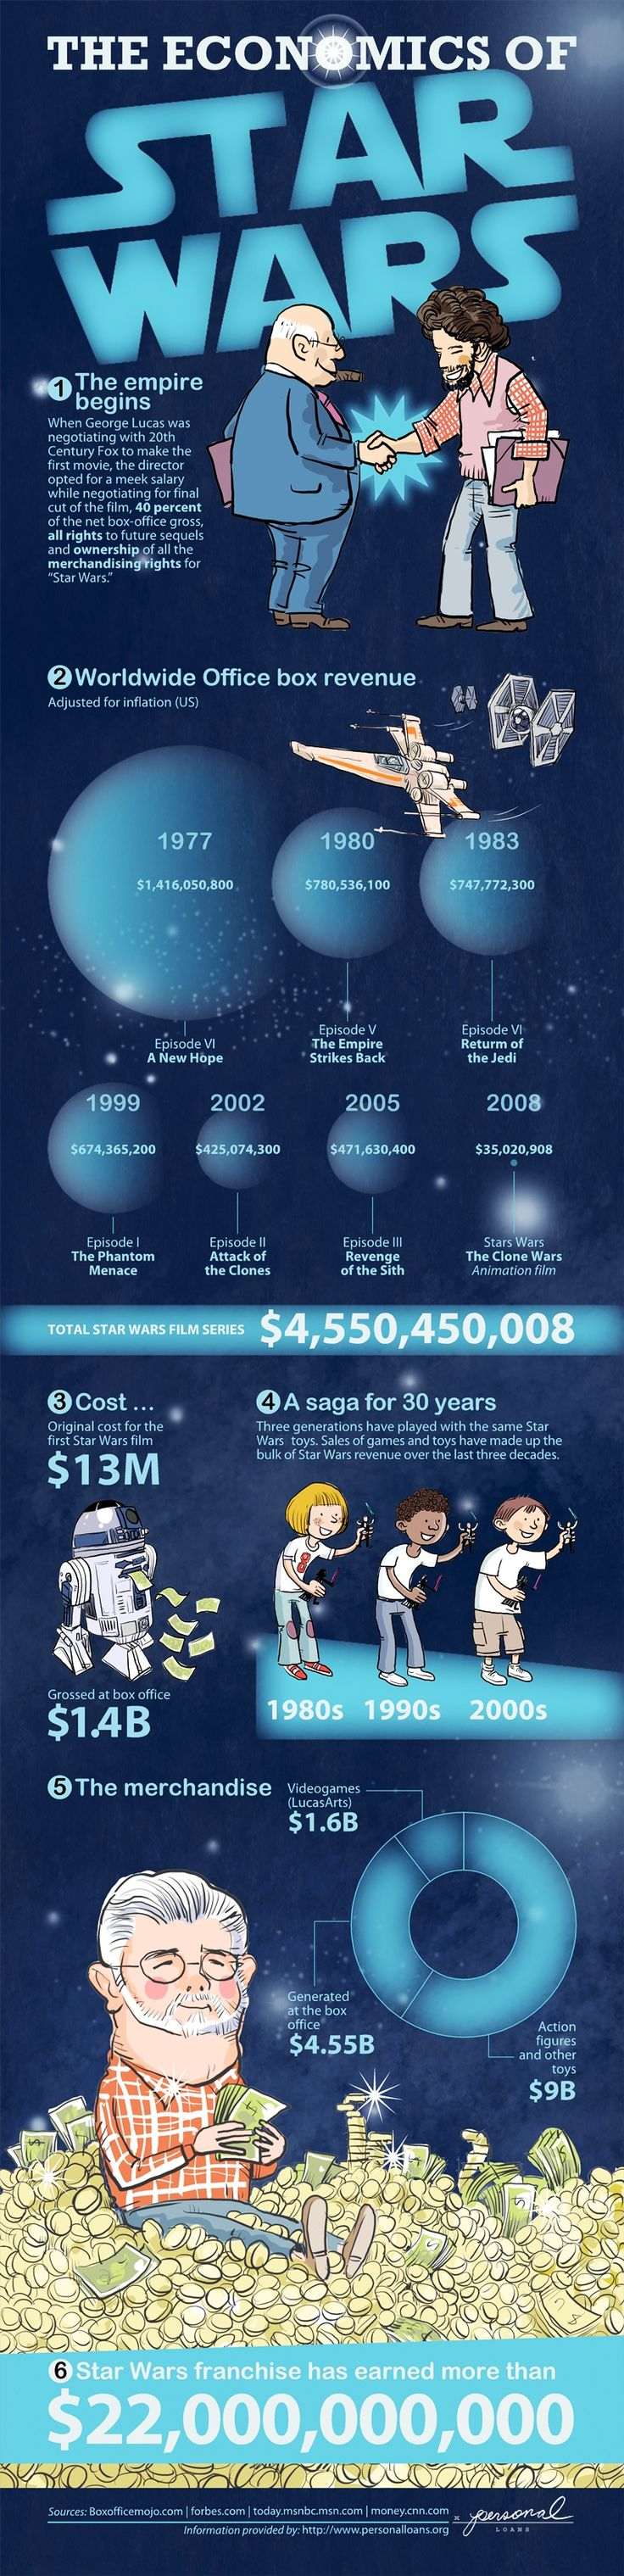 The Economics of Star Wars